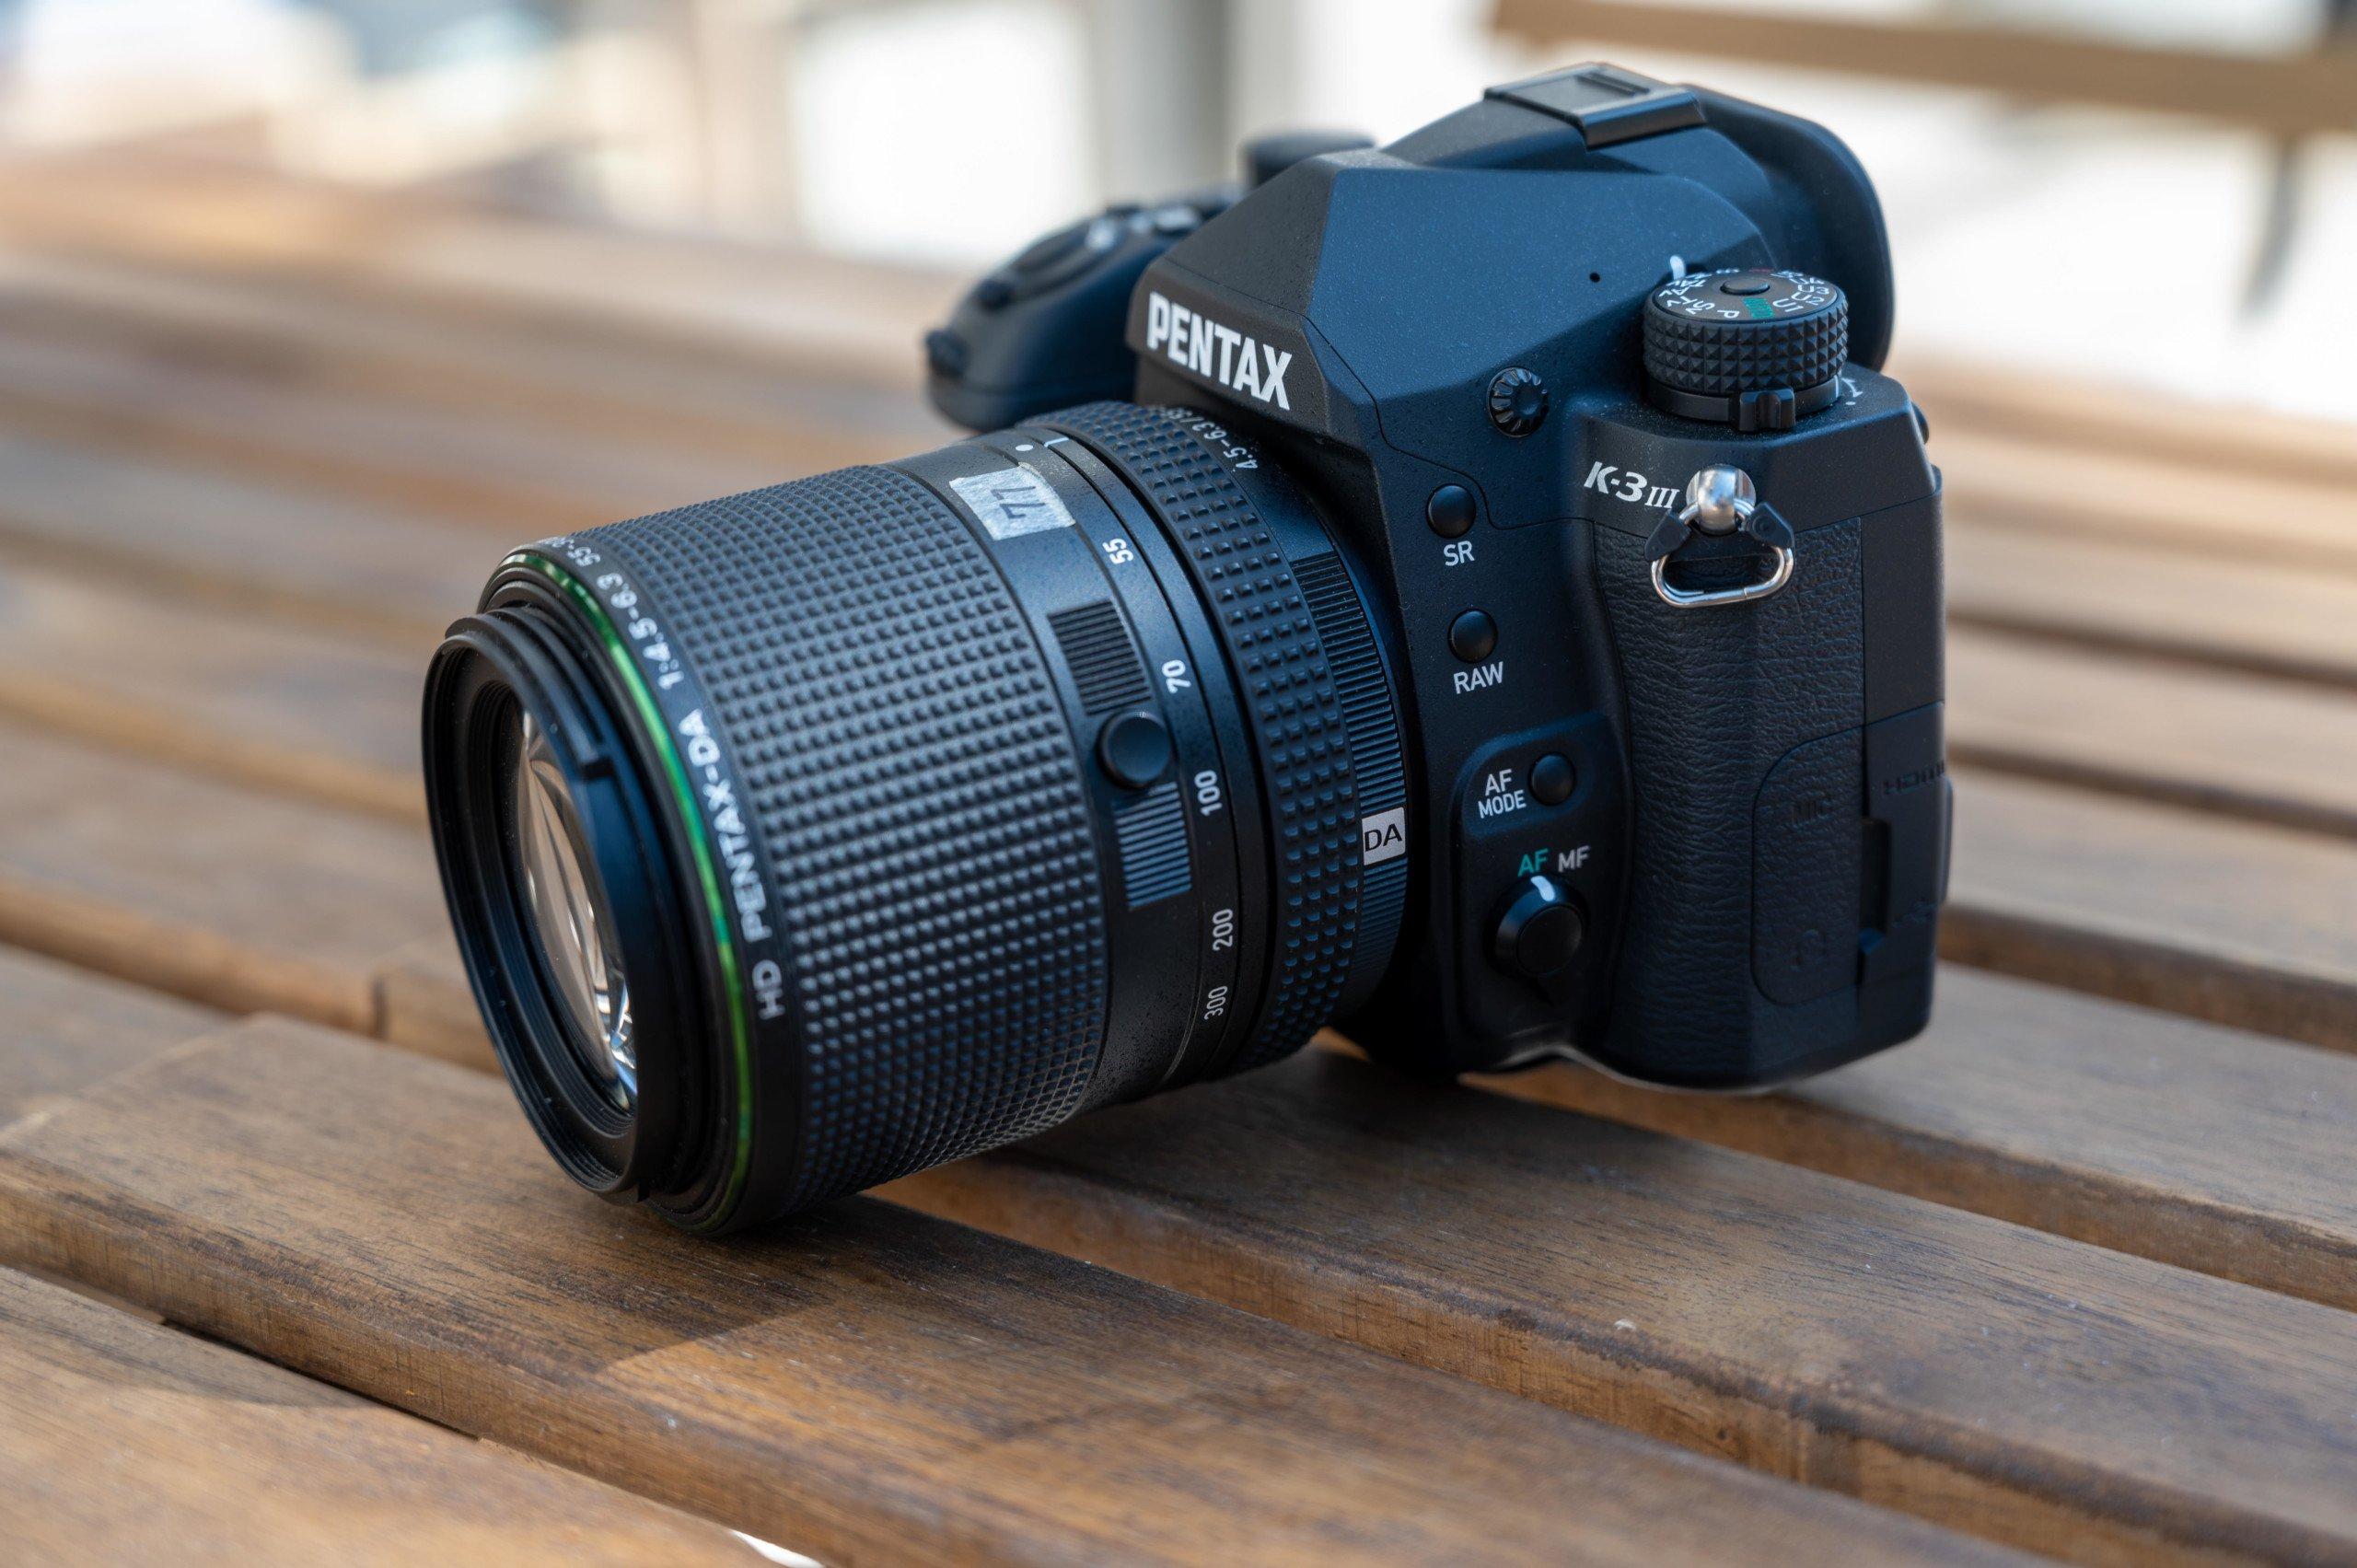 Pentax K-3 Mark III Review: An Excellent, Expensive DSLR 14